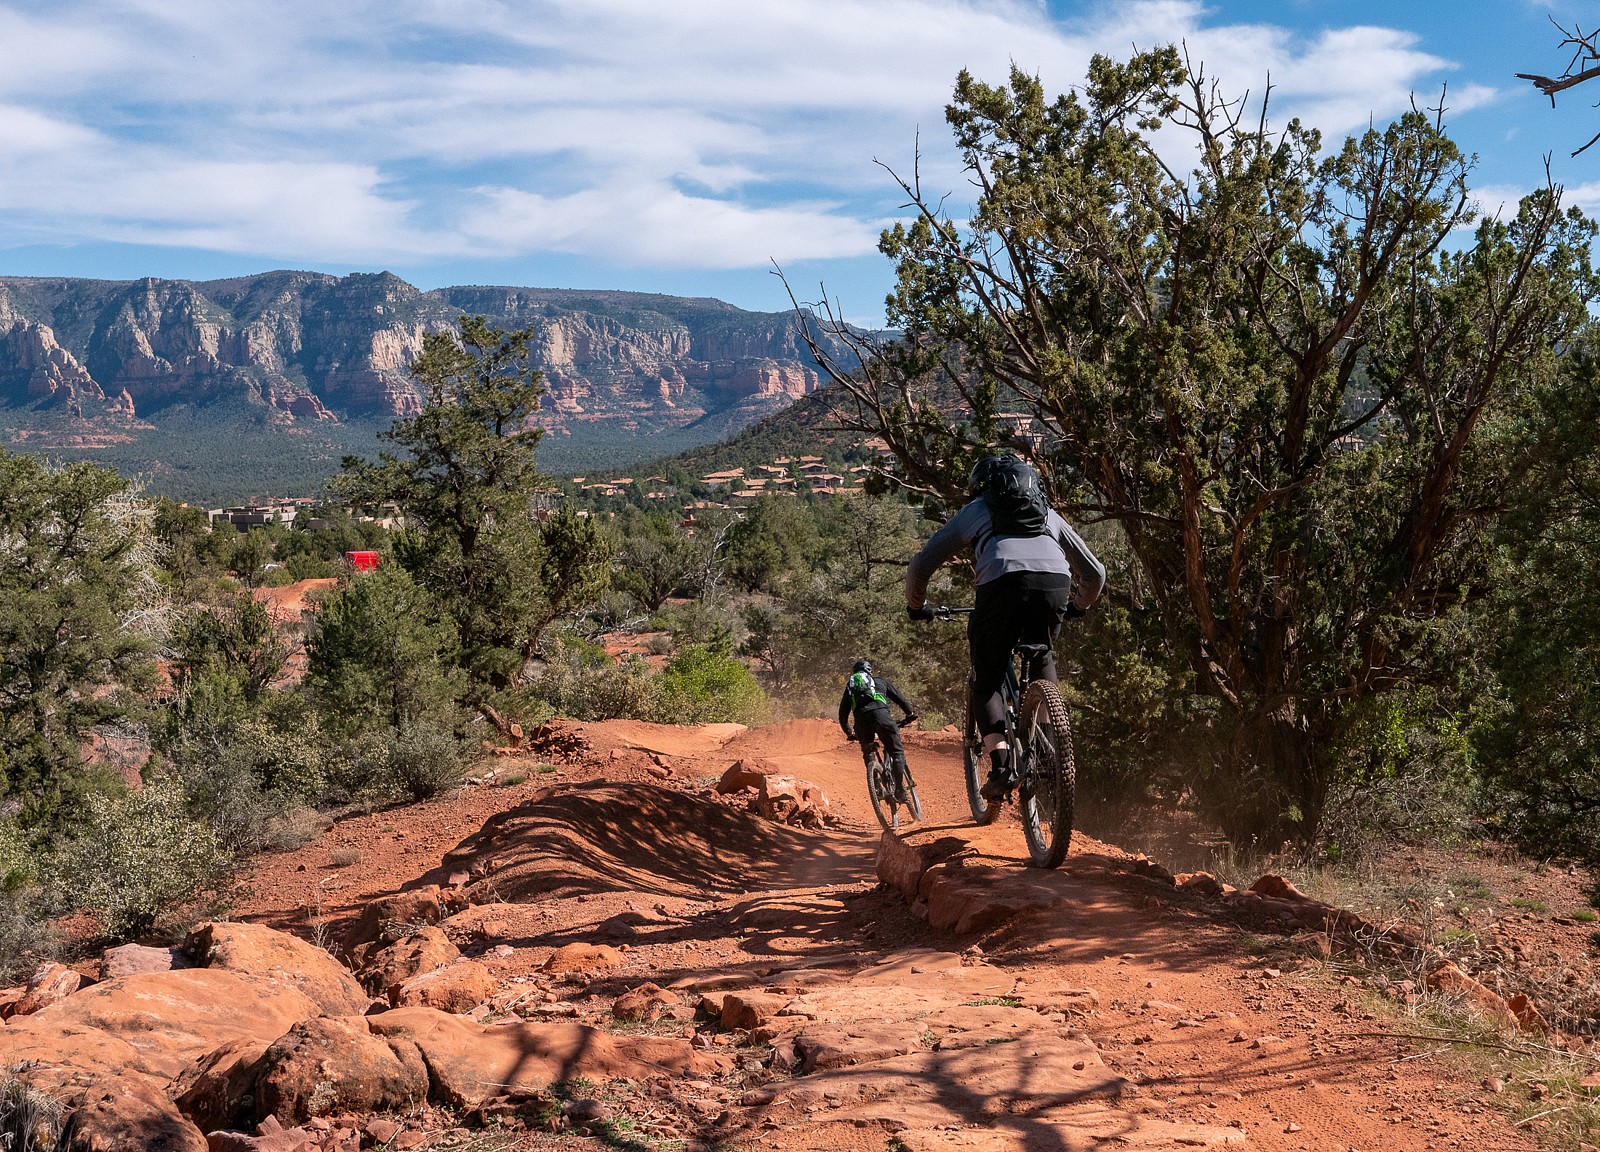 Wildcat Flow Trail, Sedona - PIT BITS 2 - Sedona Bike Festival 2020 - Mountain Biking Pictures - Vital MTB